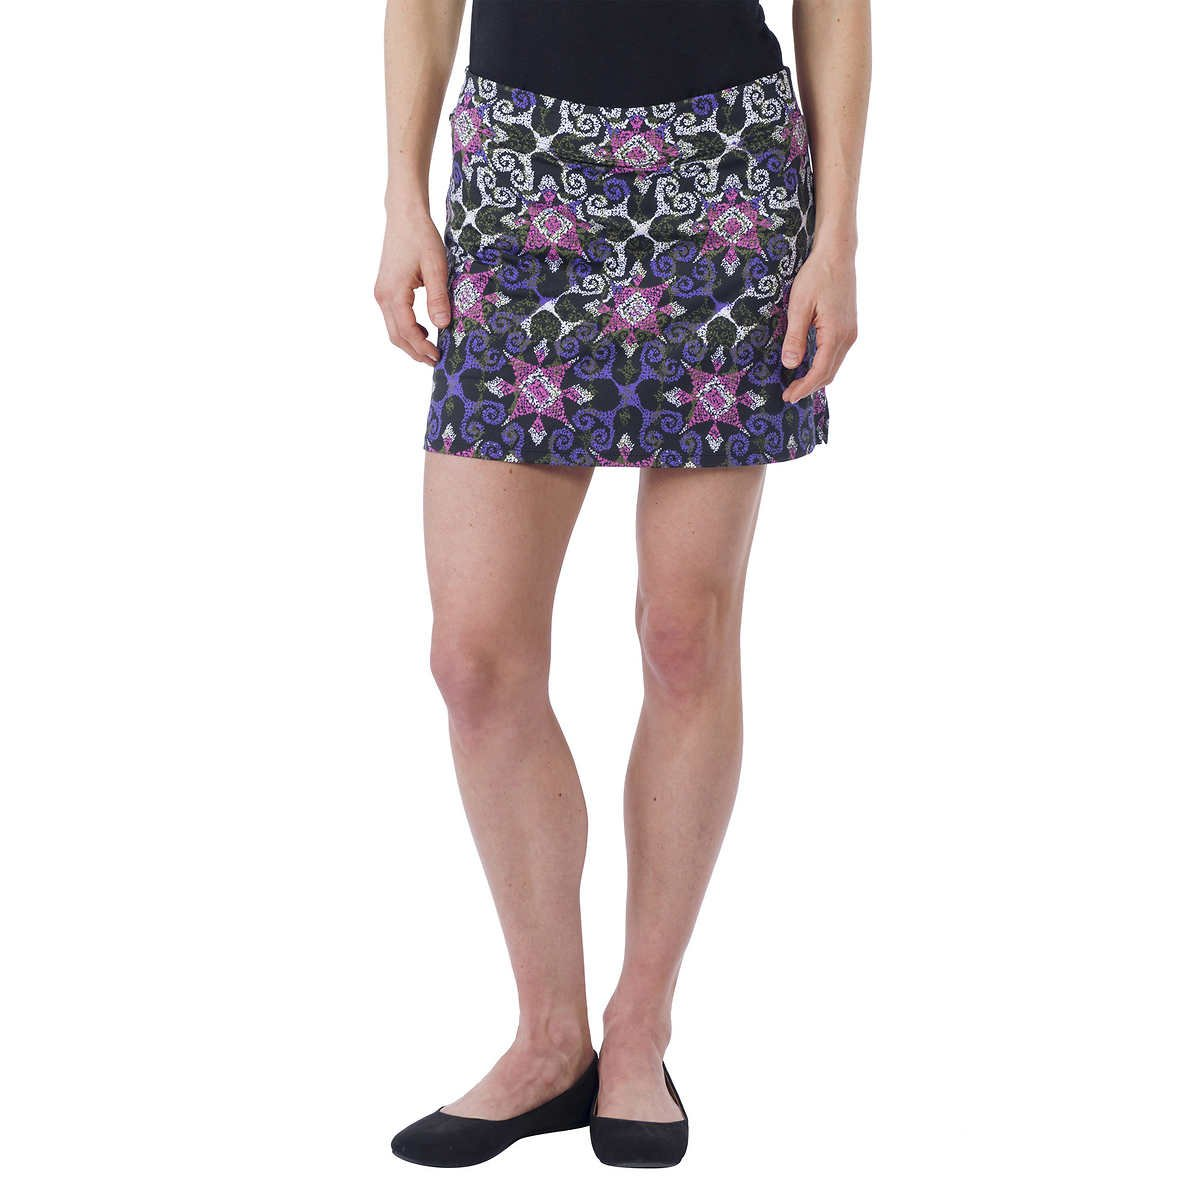 Colorado Clothing Women's Tranquility Skort, XX-Large, Starmaze